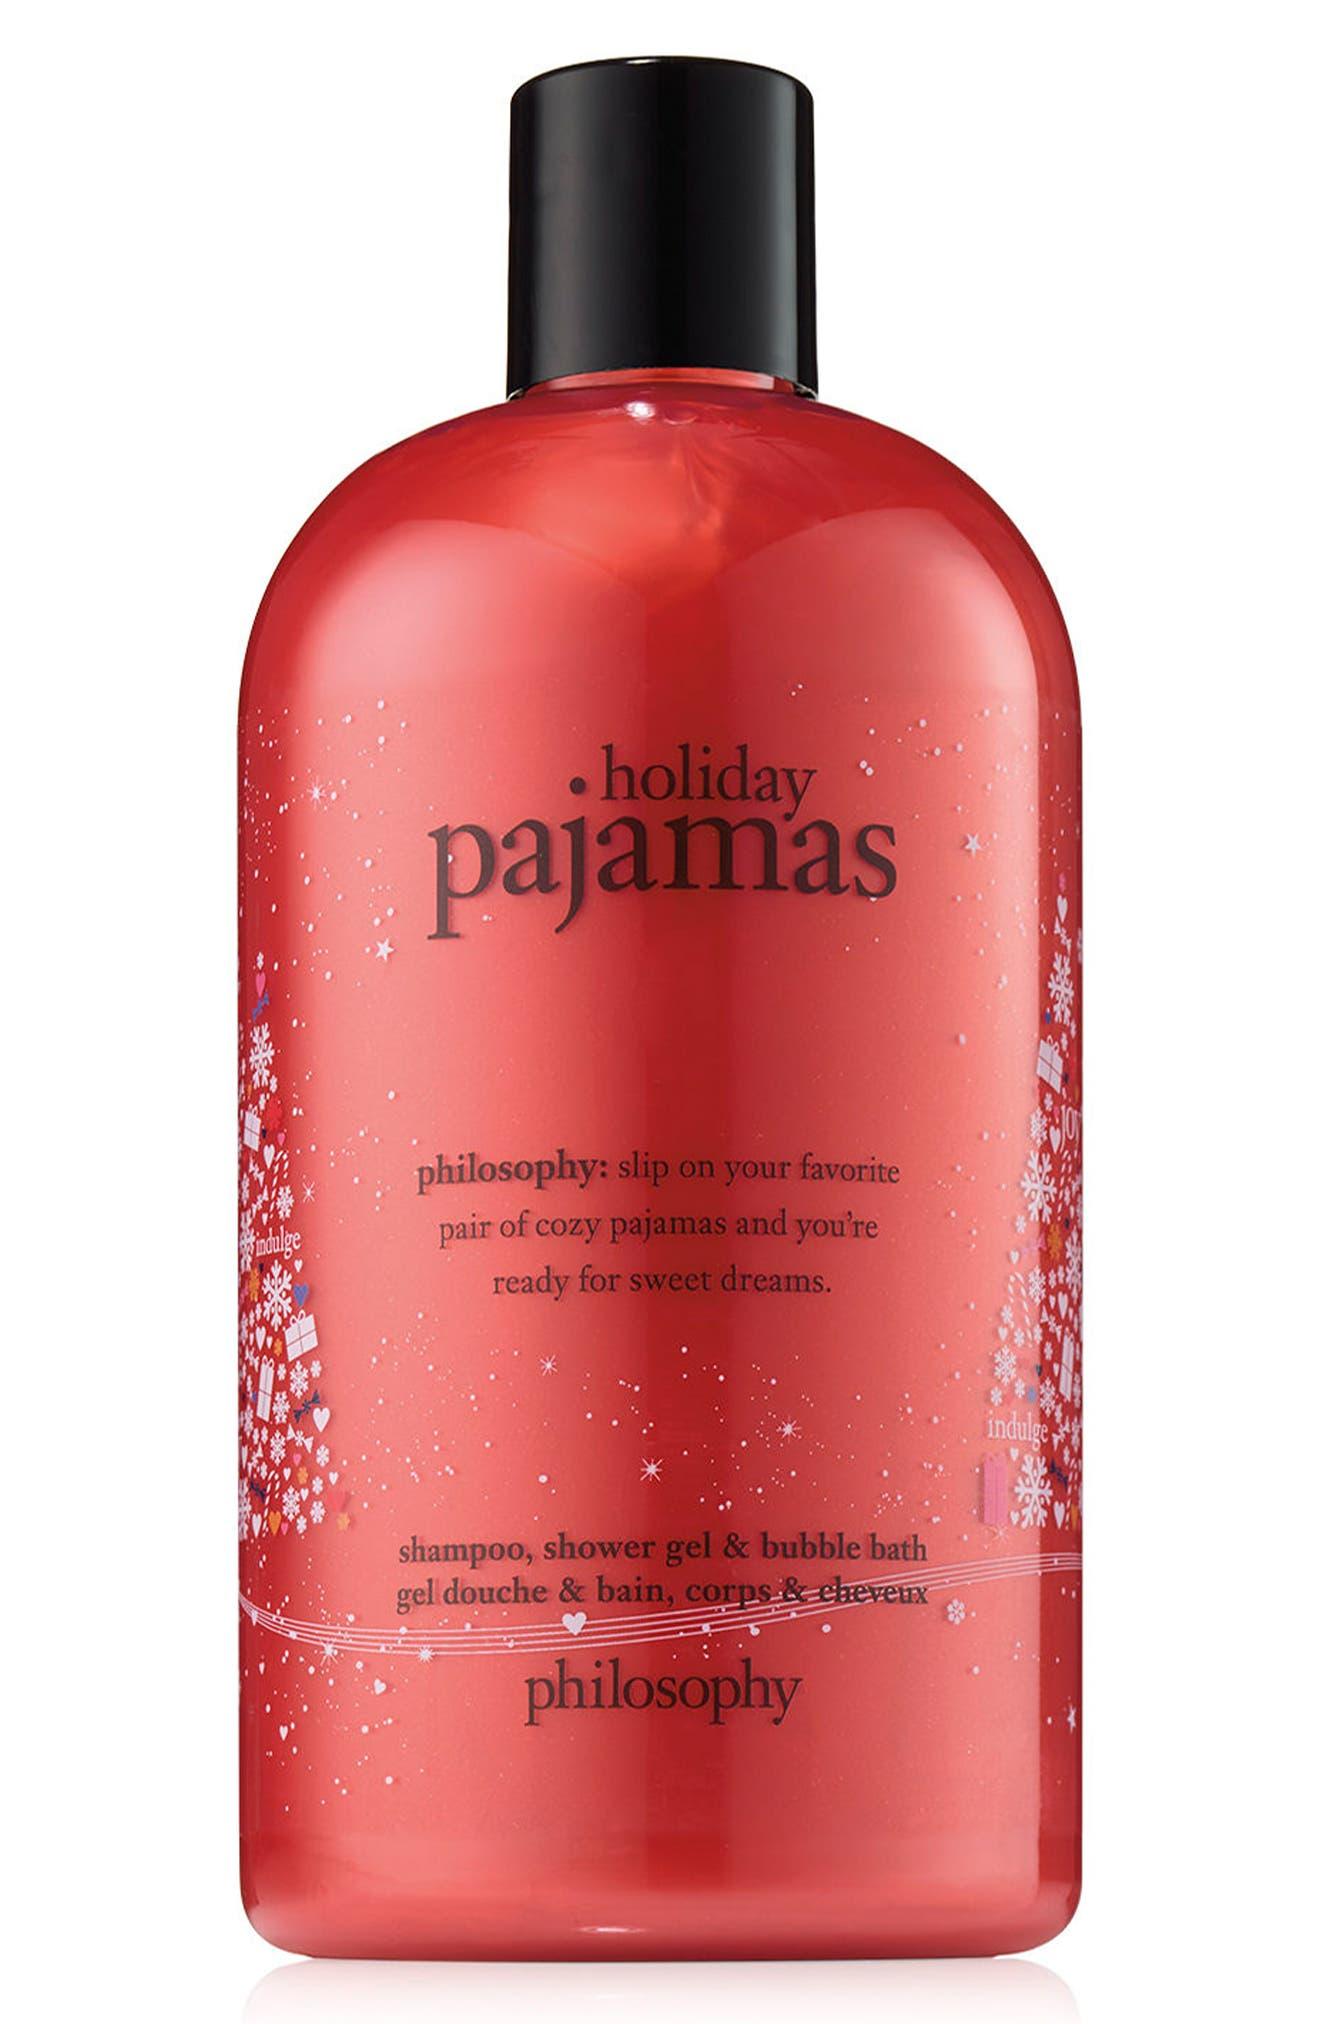 philosophy holiday pajamas shampoo, shower gel & bubble bath (Limited Edition)